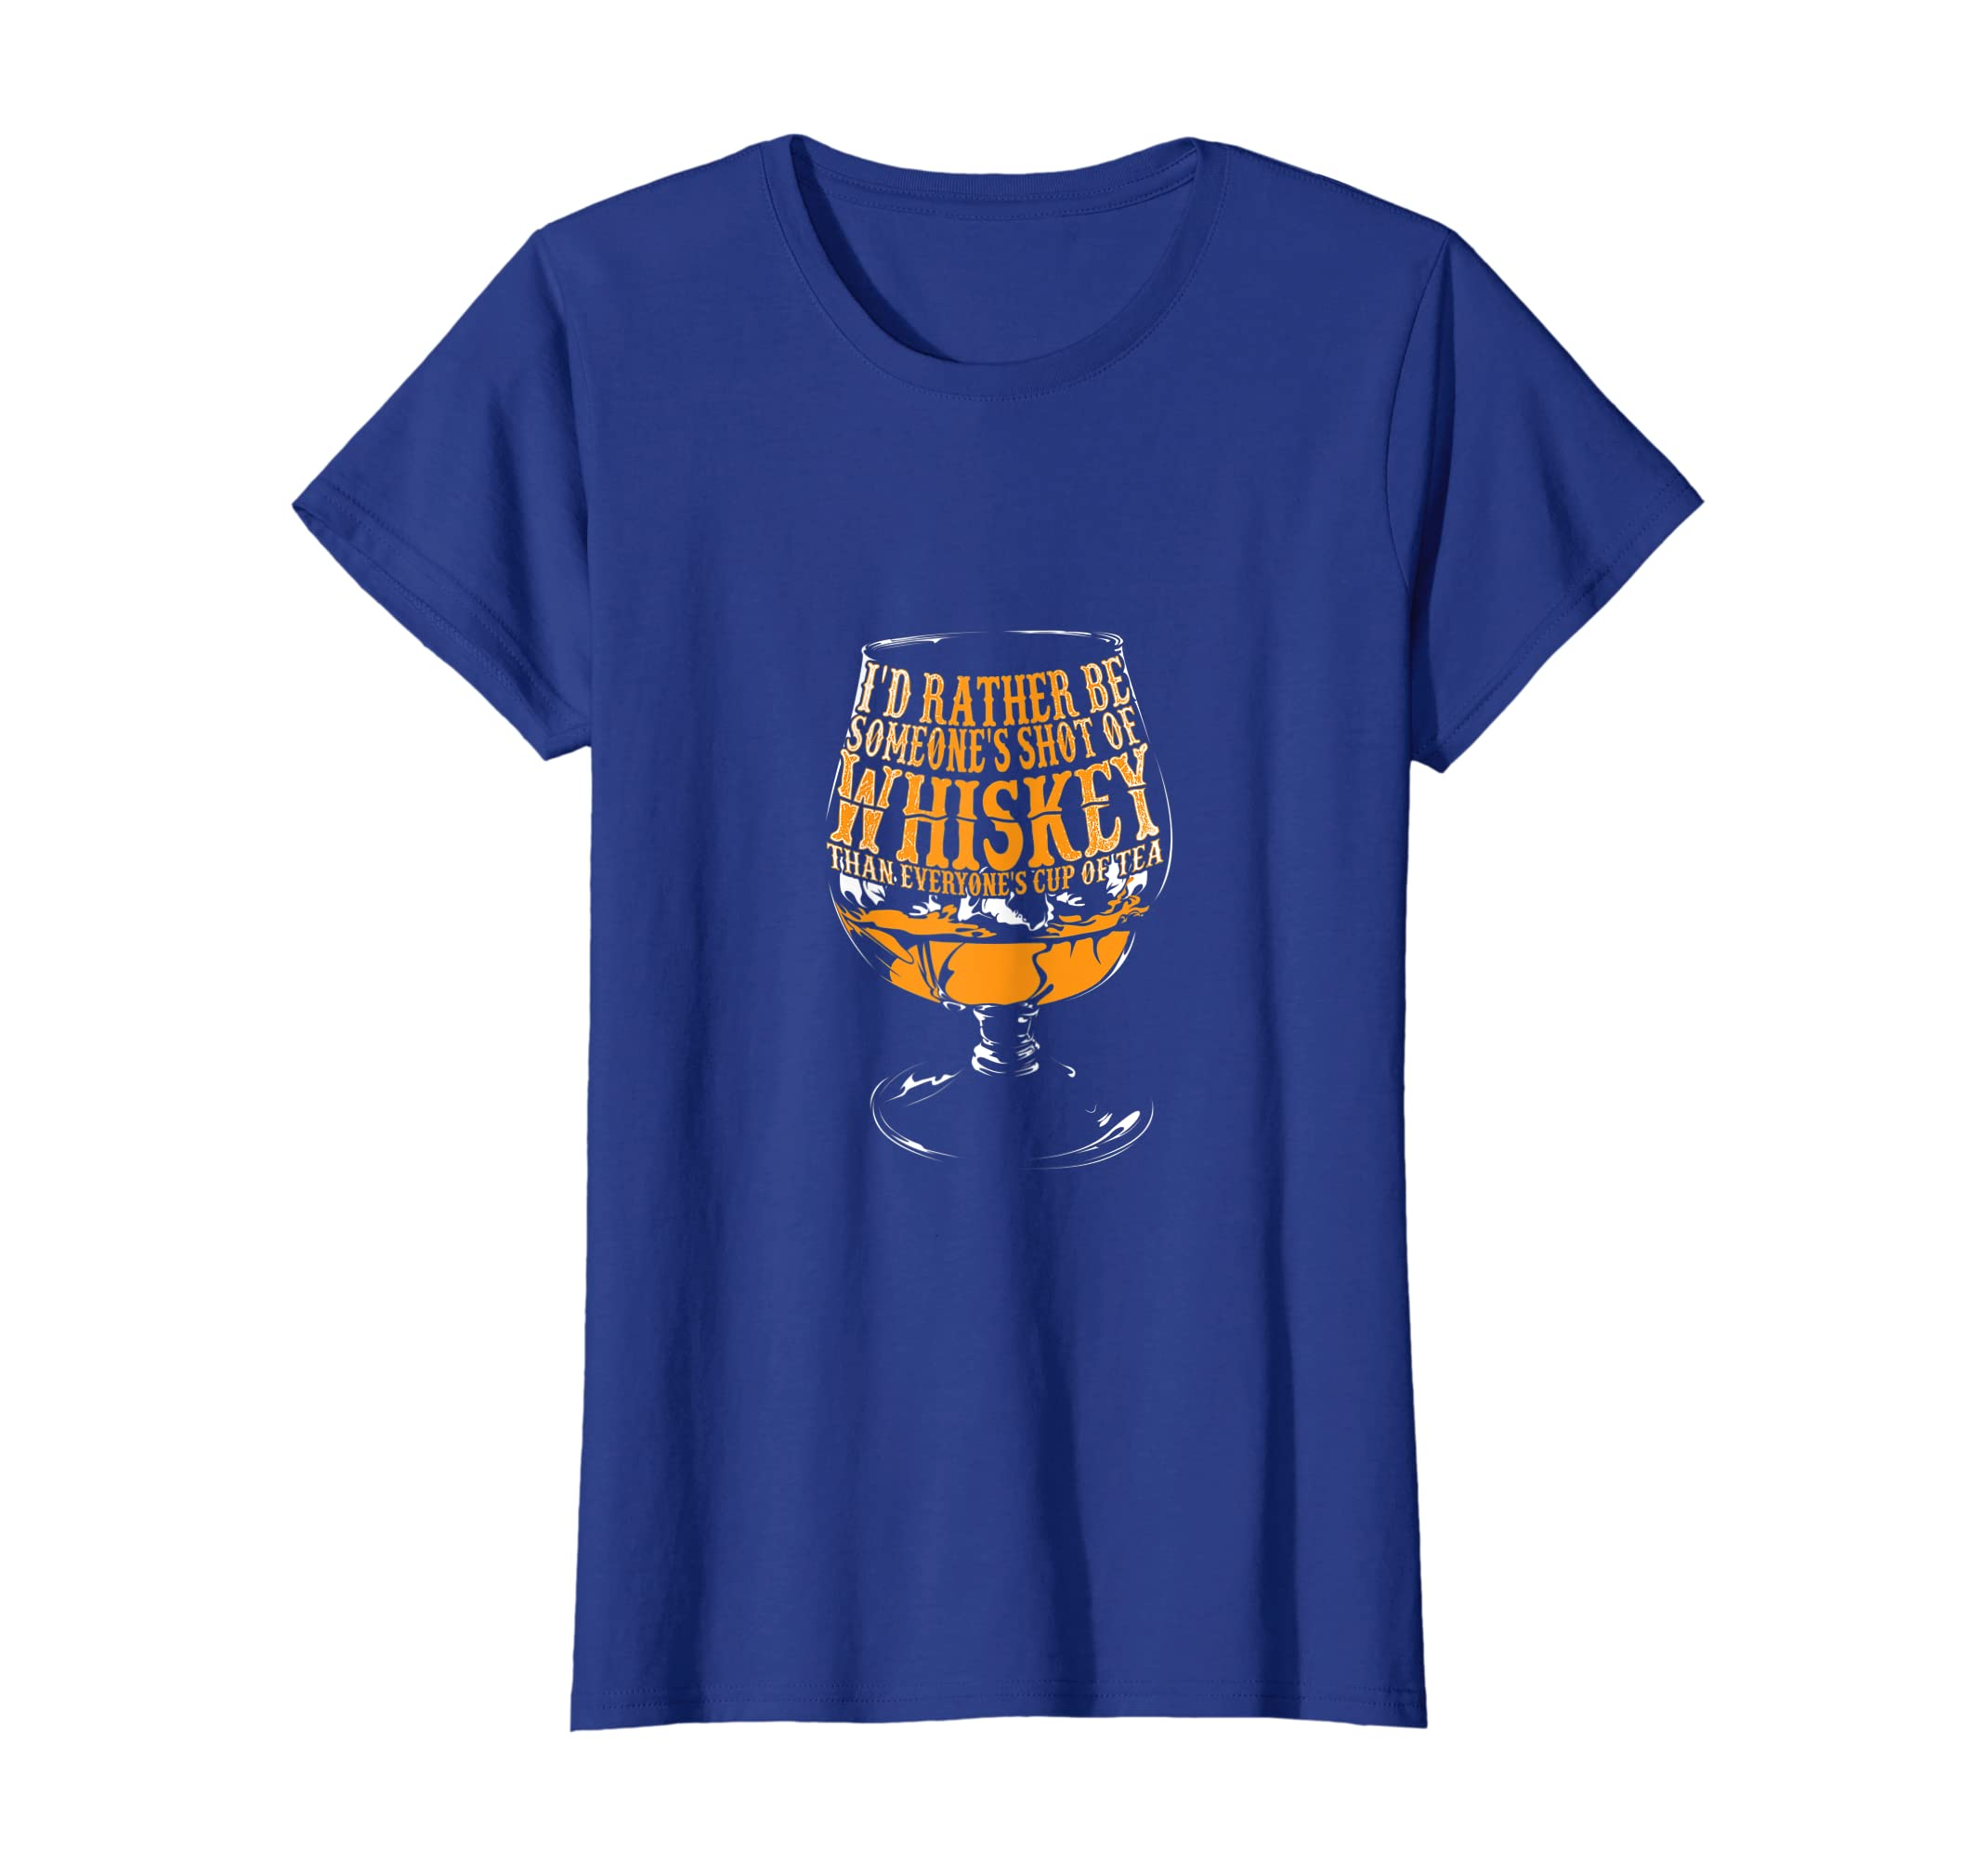 b4b4294c Amazon.com: Funny Whiskey Saying T-Shirt Women Whisky Lover Gift Scotch:  Clothing